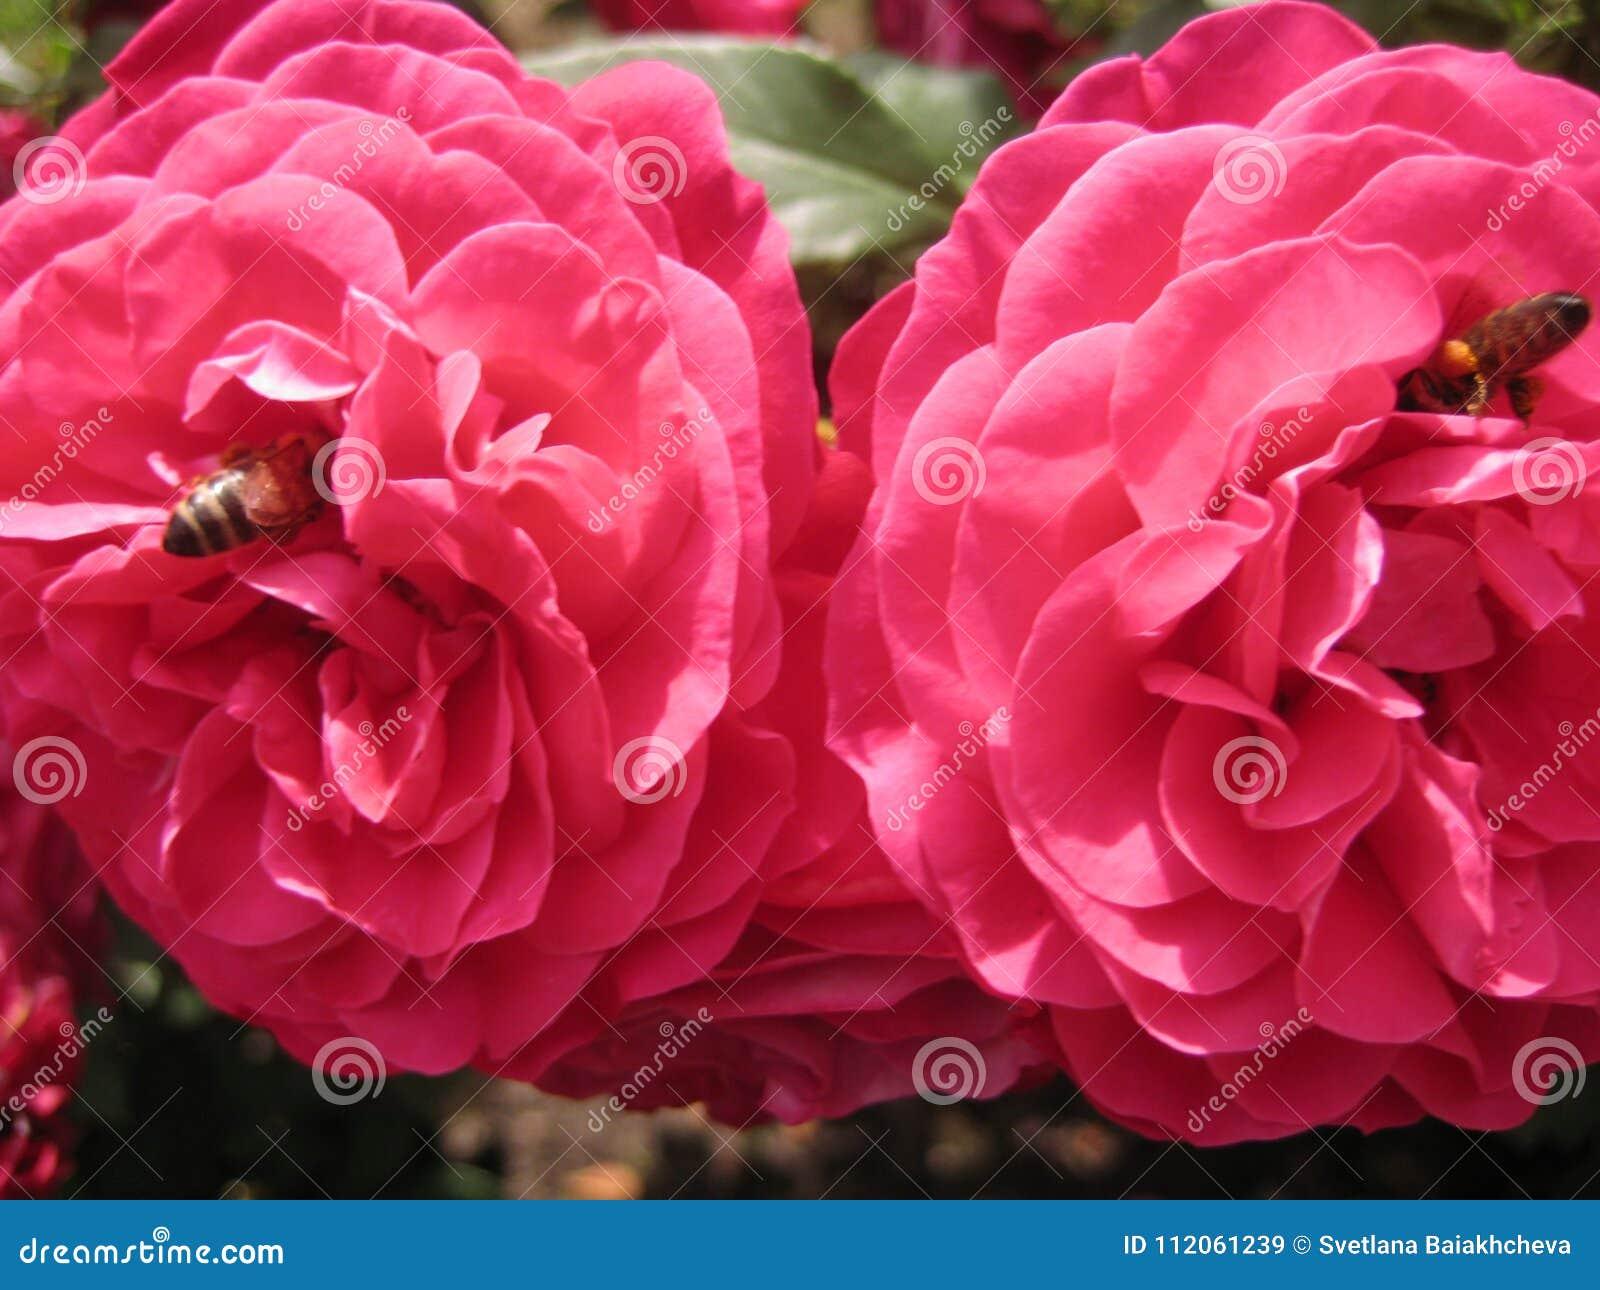 Macro Photo With Decorative Background Of Beautiful Rose Flowers